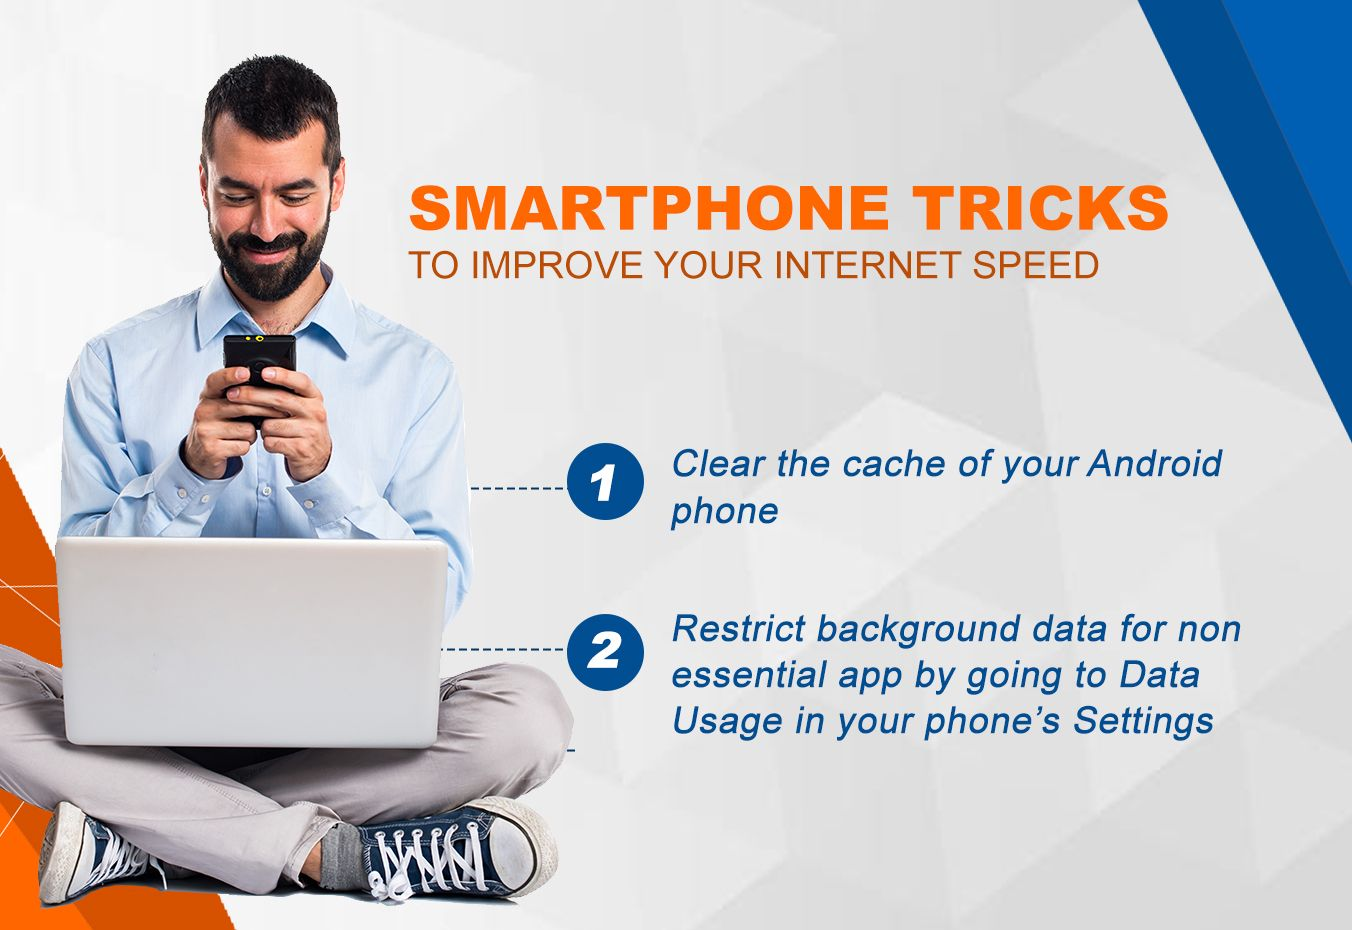 Ngc Broadband Wifi Connection Provider Of Guwahati Assam India Broadband Internet Serviceprovider Inter Internet Speed Wifi Providers Smartphone Hacks